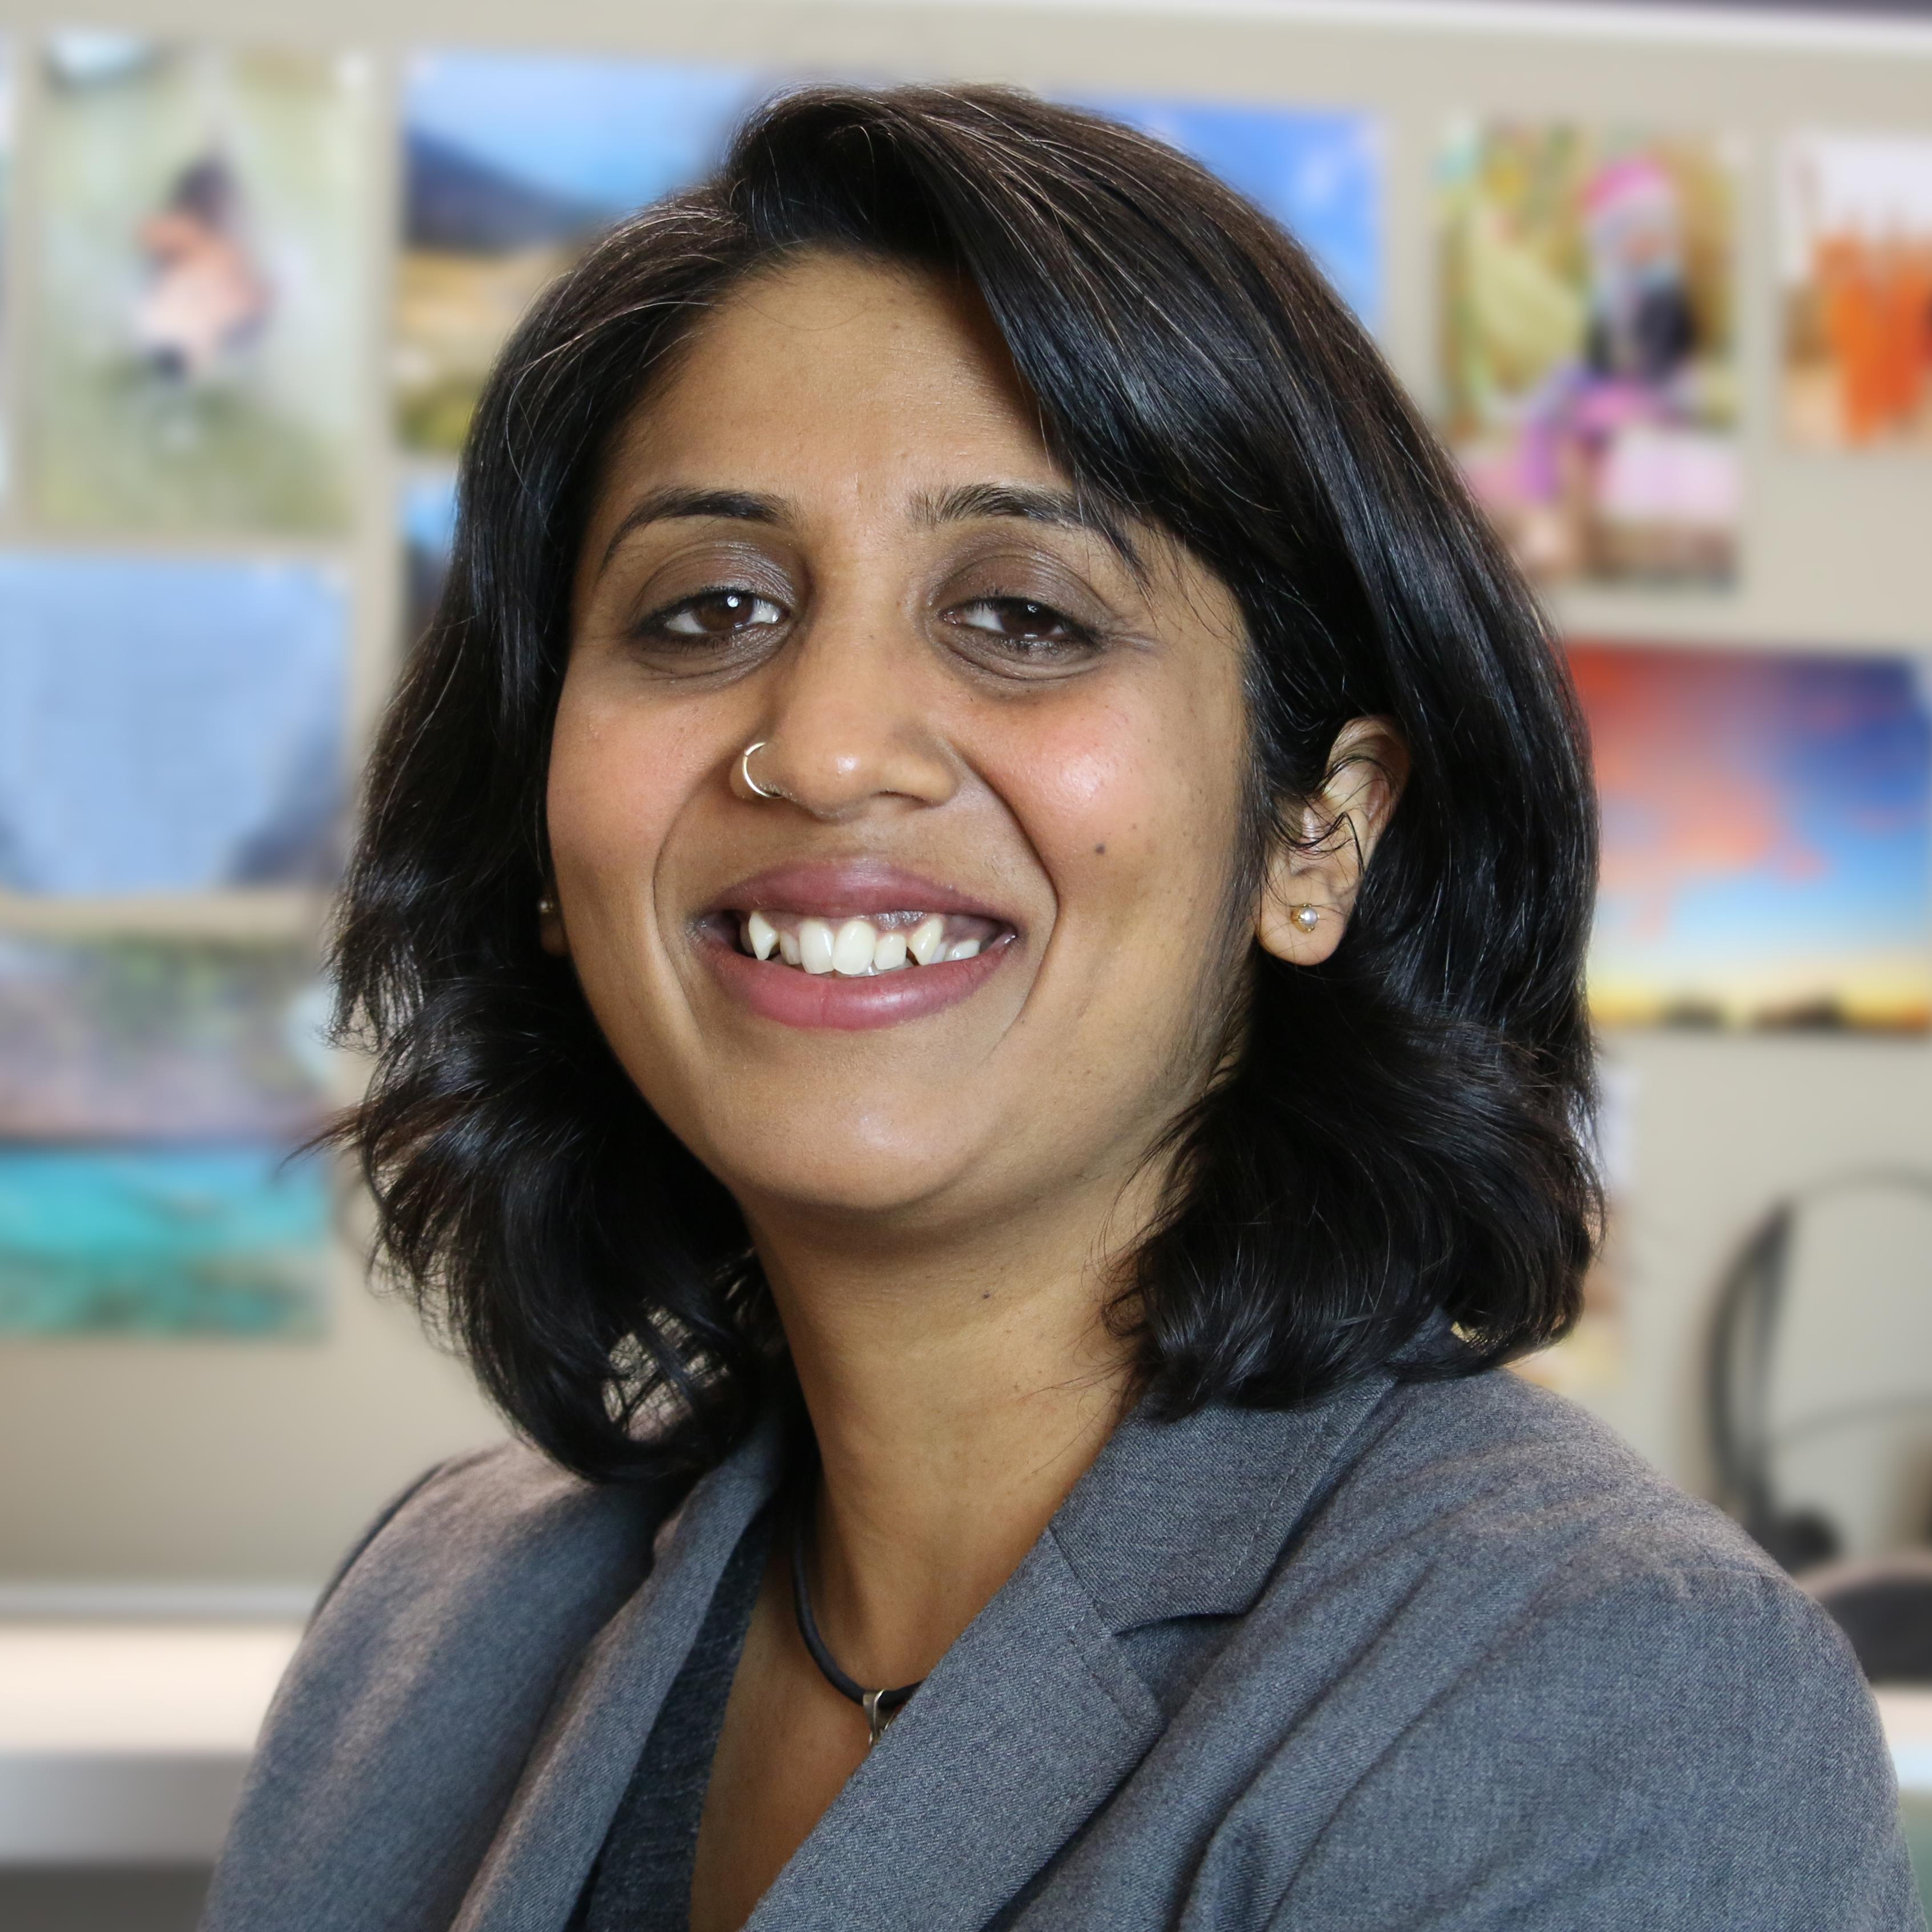 Veena Ramani Headshot (Full).jpg